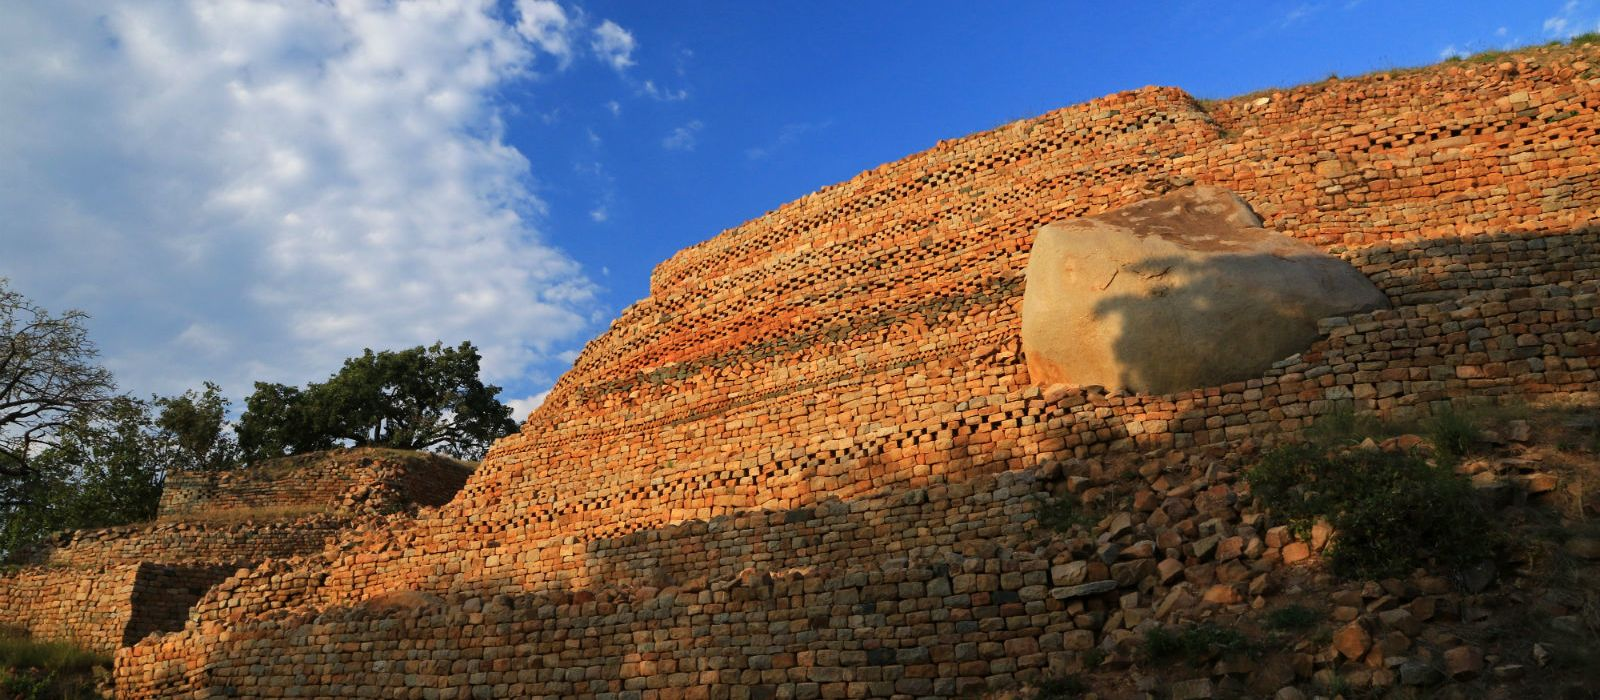 Ruins-of-Khami-near-Bulawayo-thing to do in Zimbabwe - History of Zimbabwe